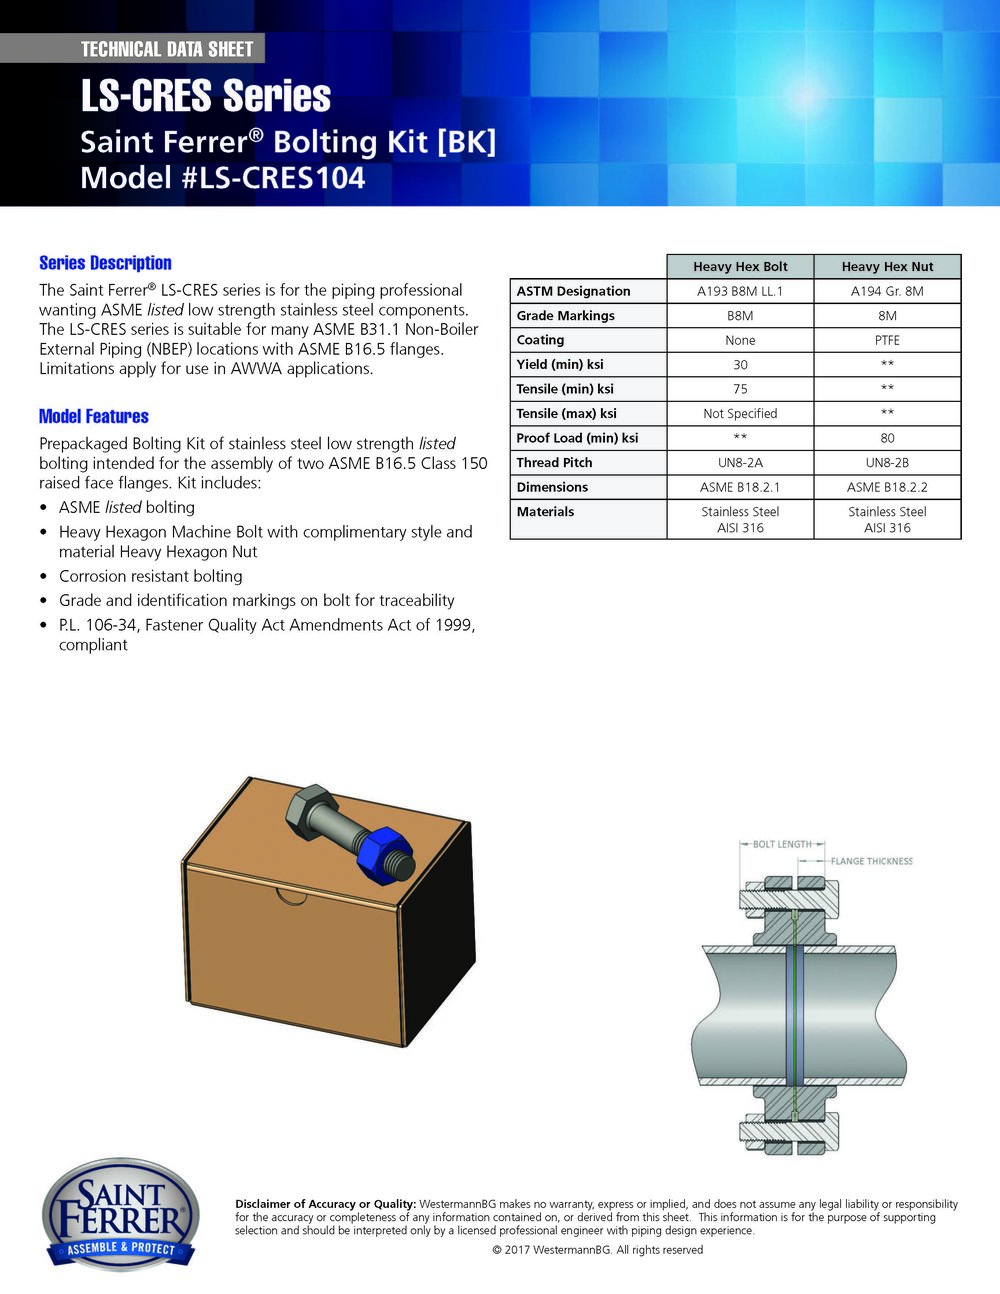 SF_Data_Sheet_LS-CRES_Series_LS-CRES104.jpg